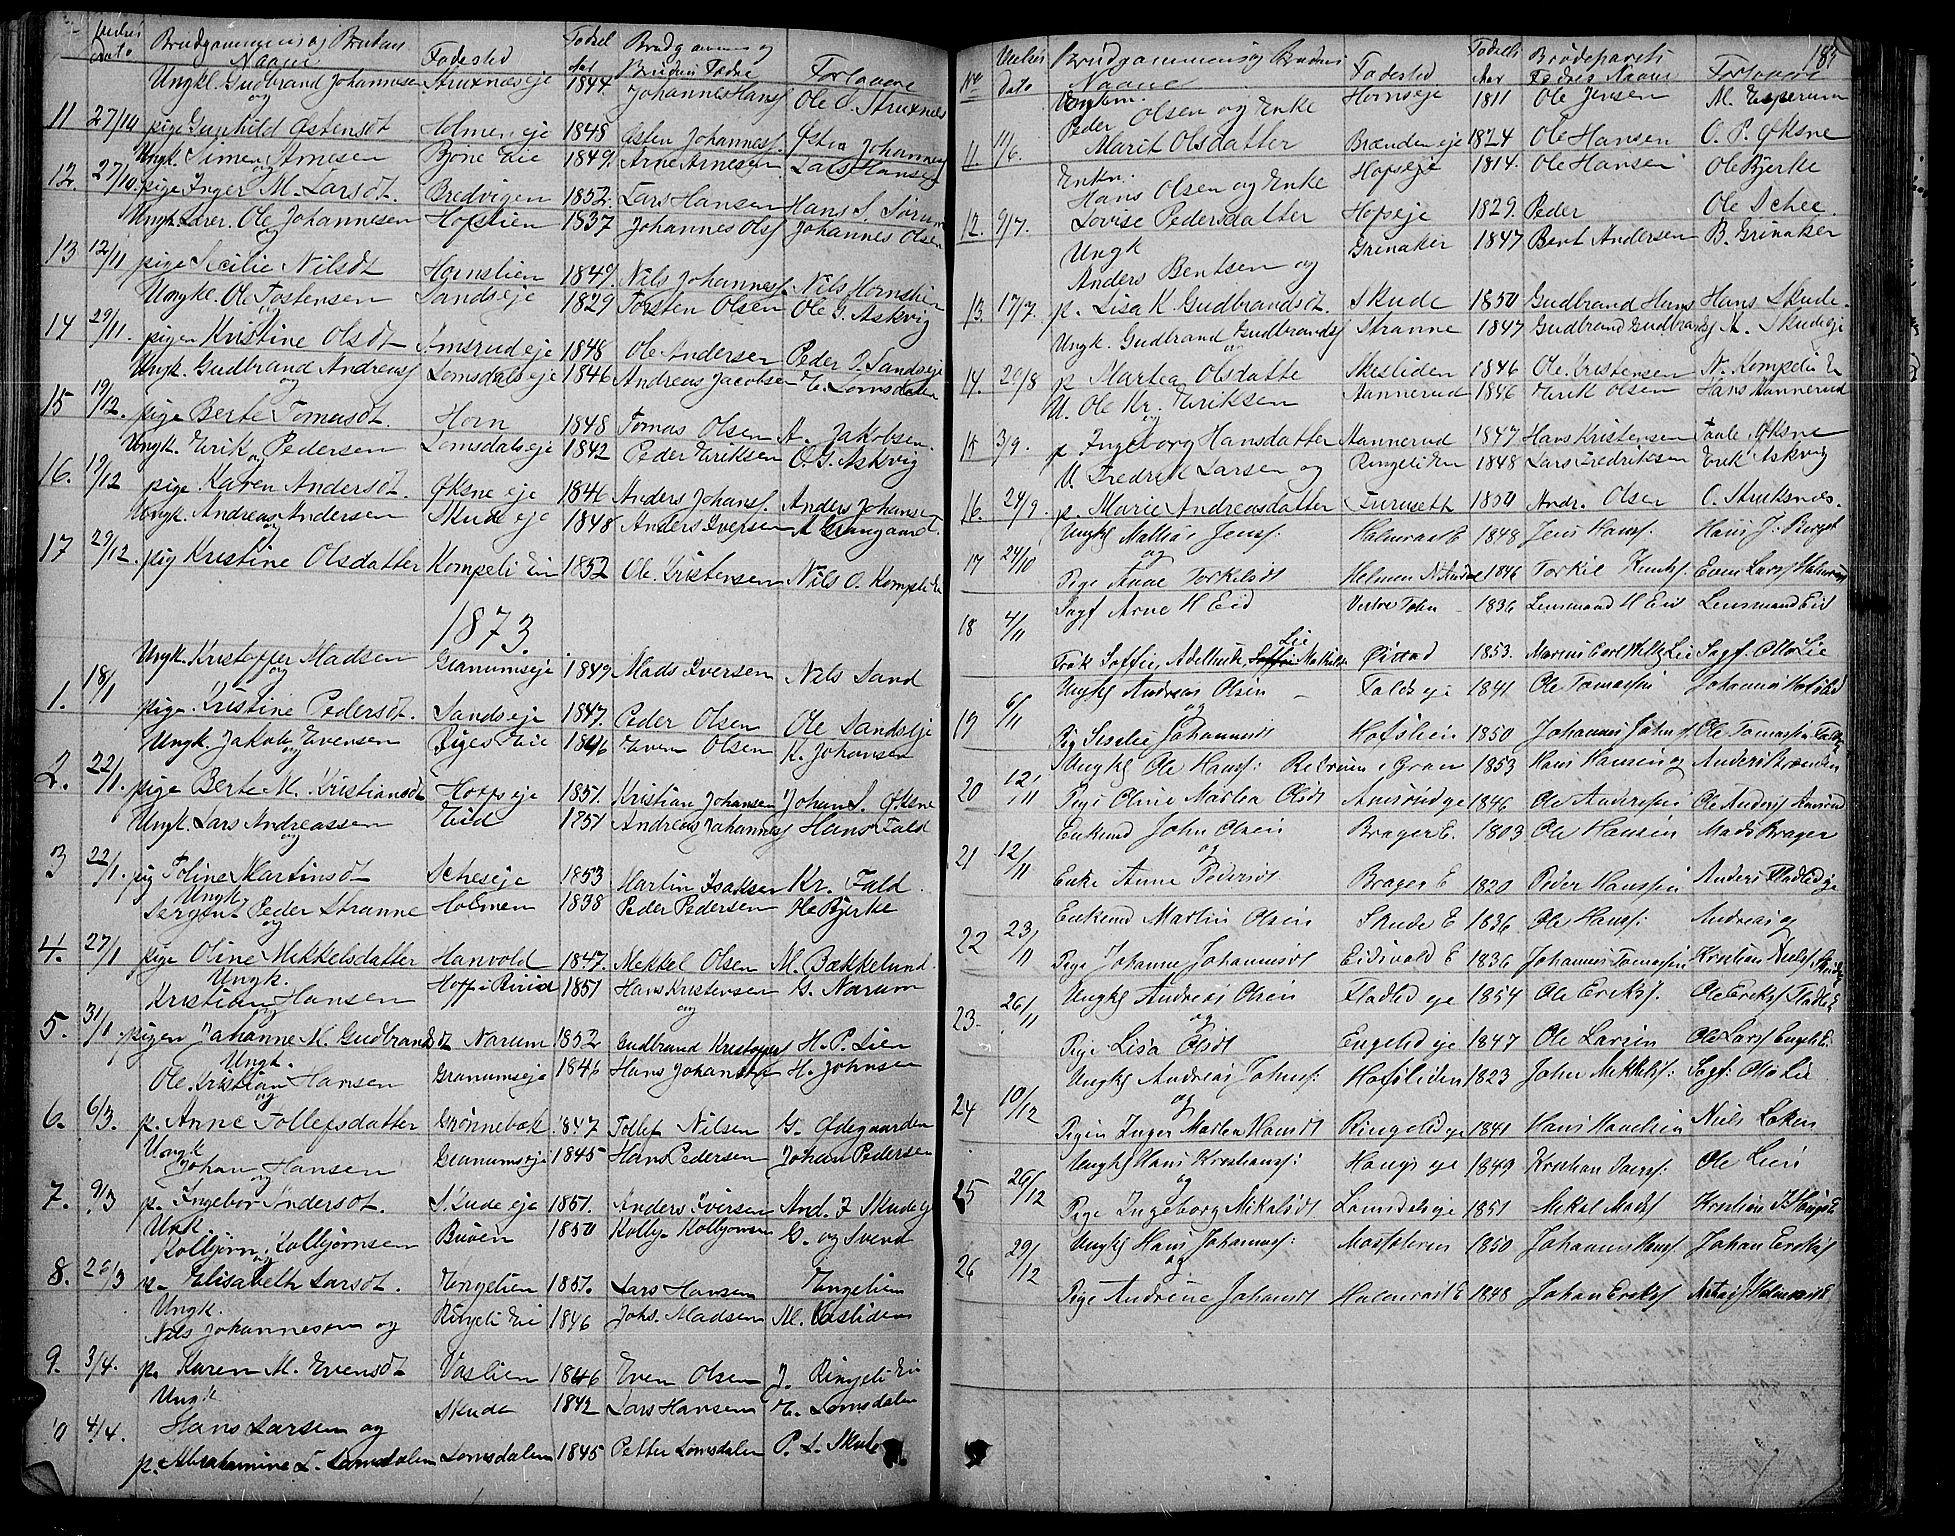 SAH, Søndre Land prestekontor, L/L0001: Klokkerbok nr. 1, 1849-1883, s. 185